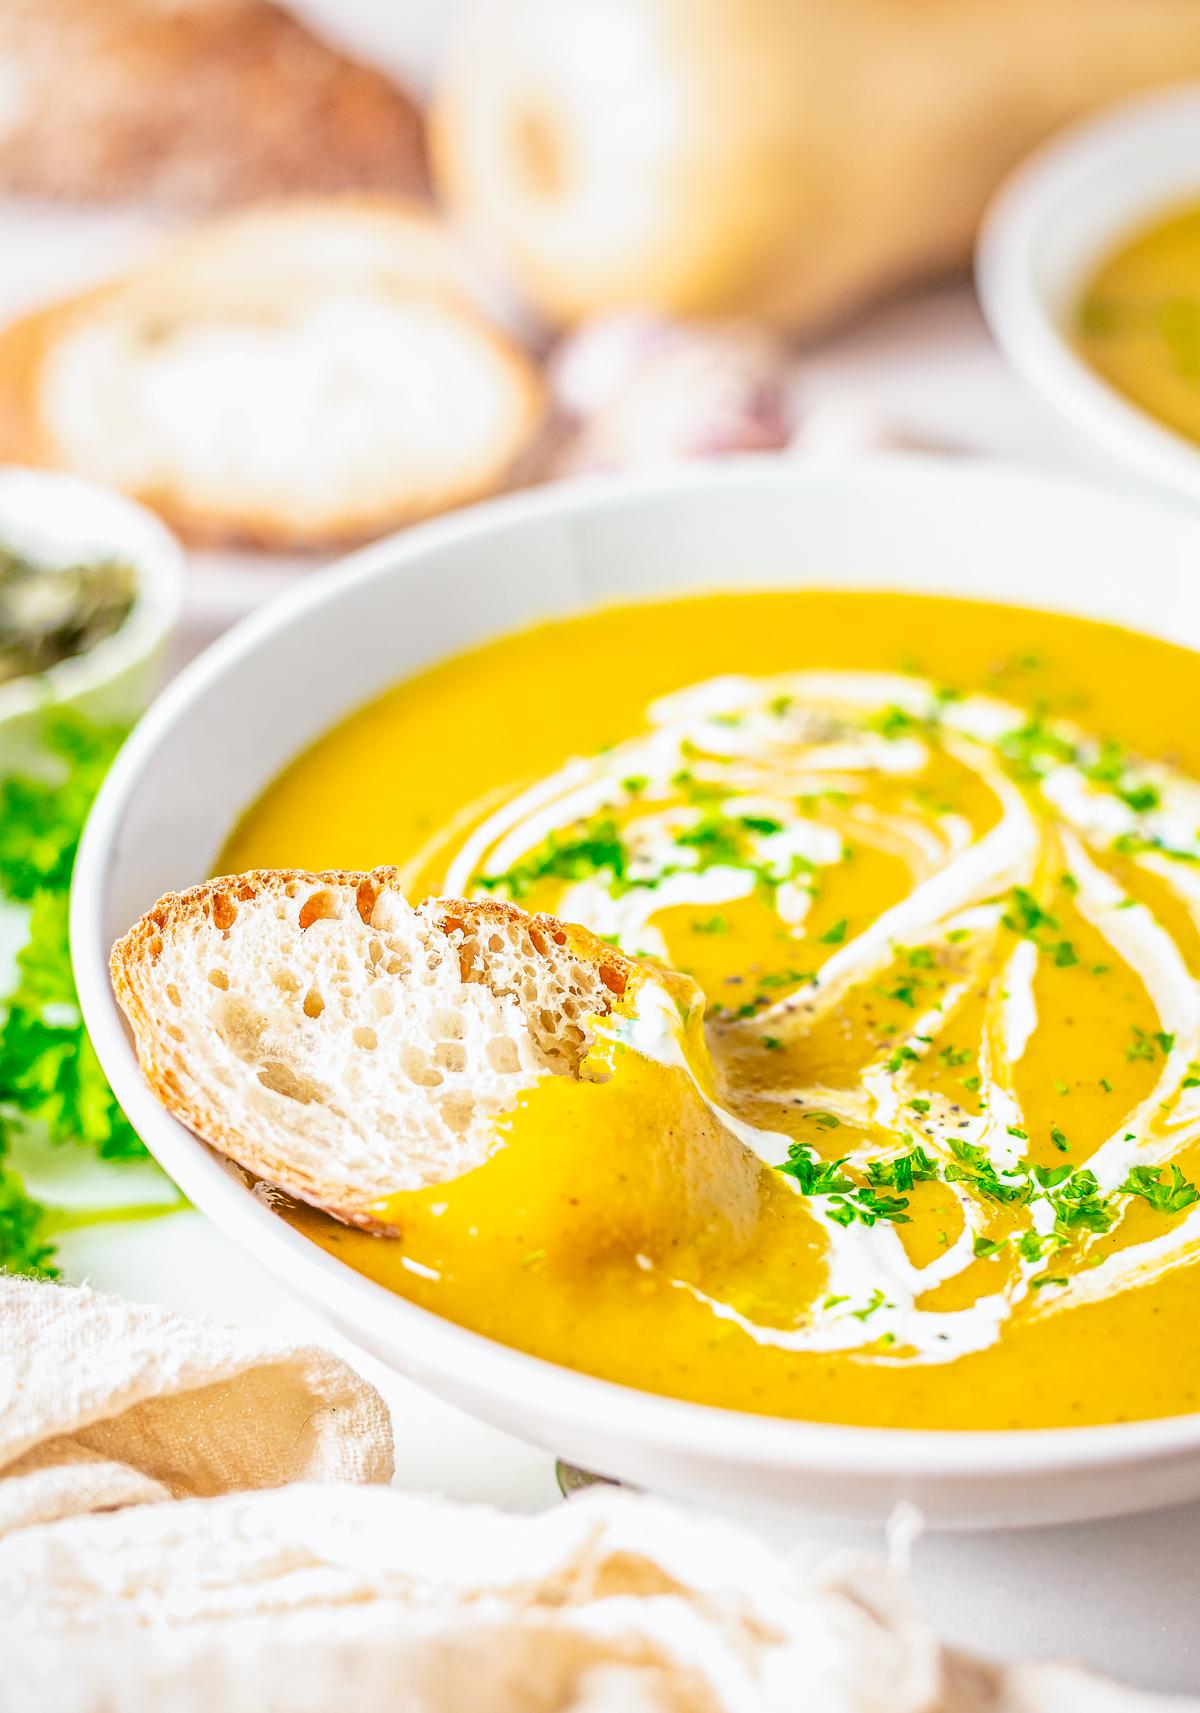 Bread in bowl of The Best Butternut Squash Soup Recipe.